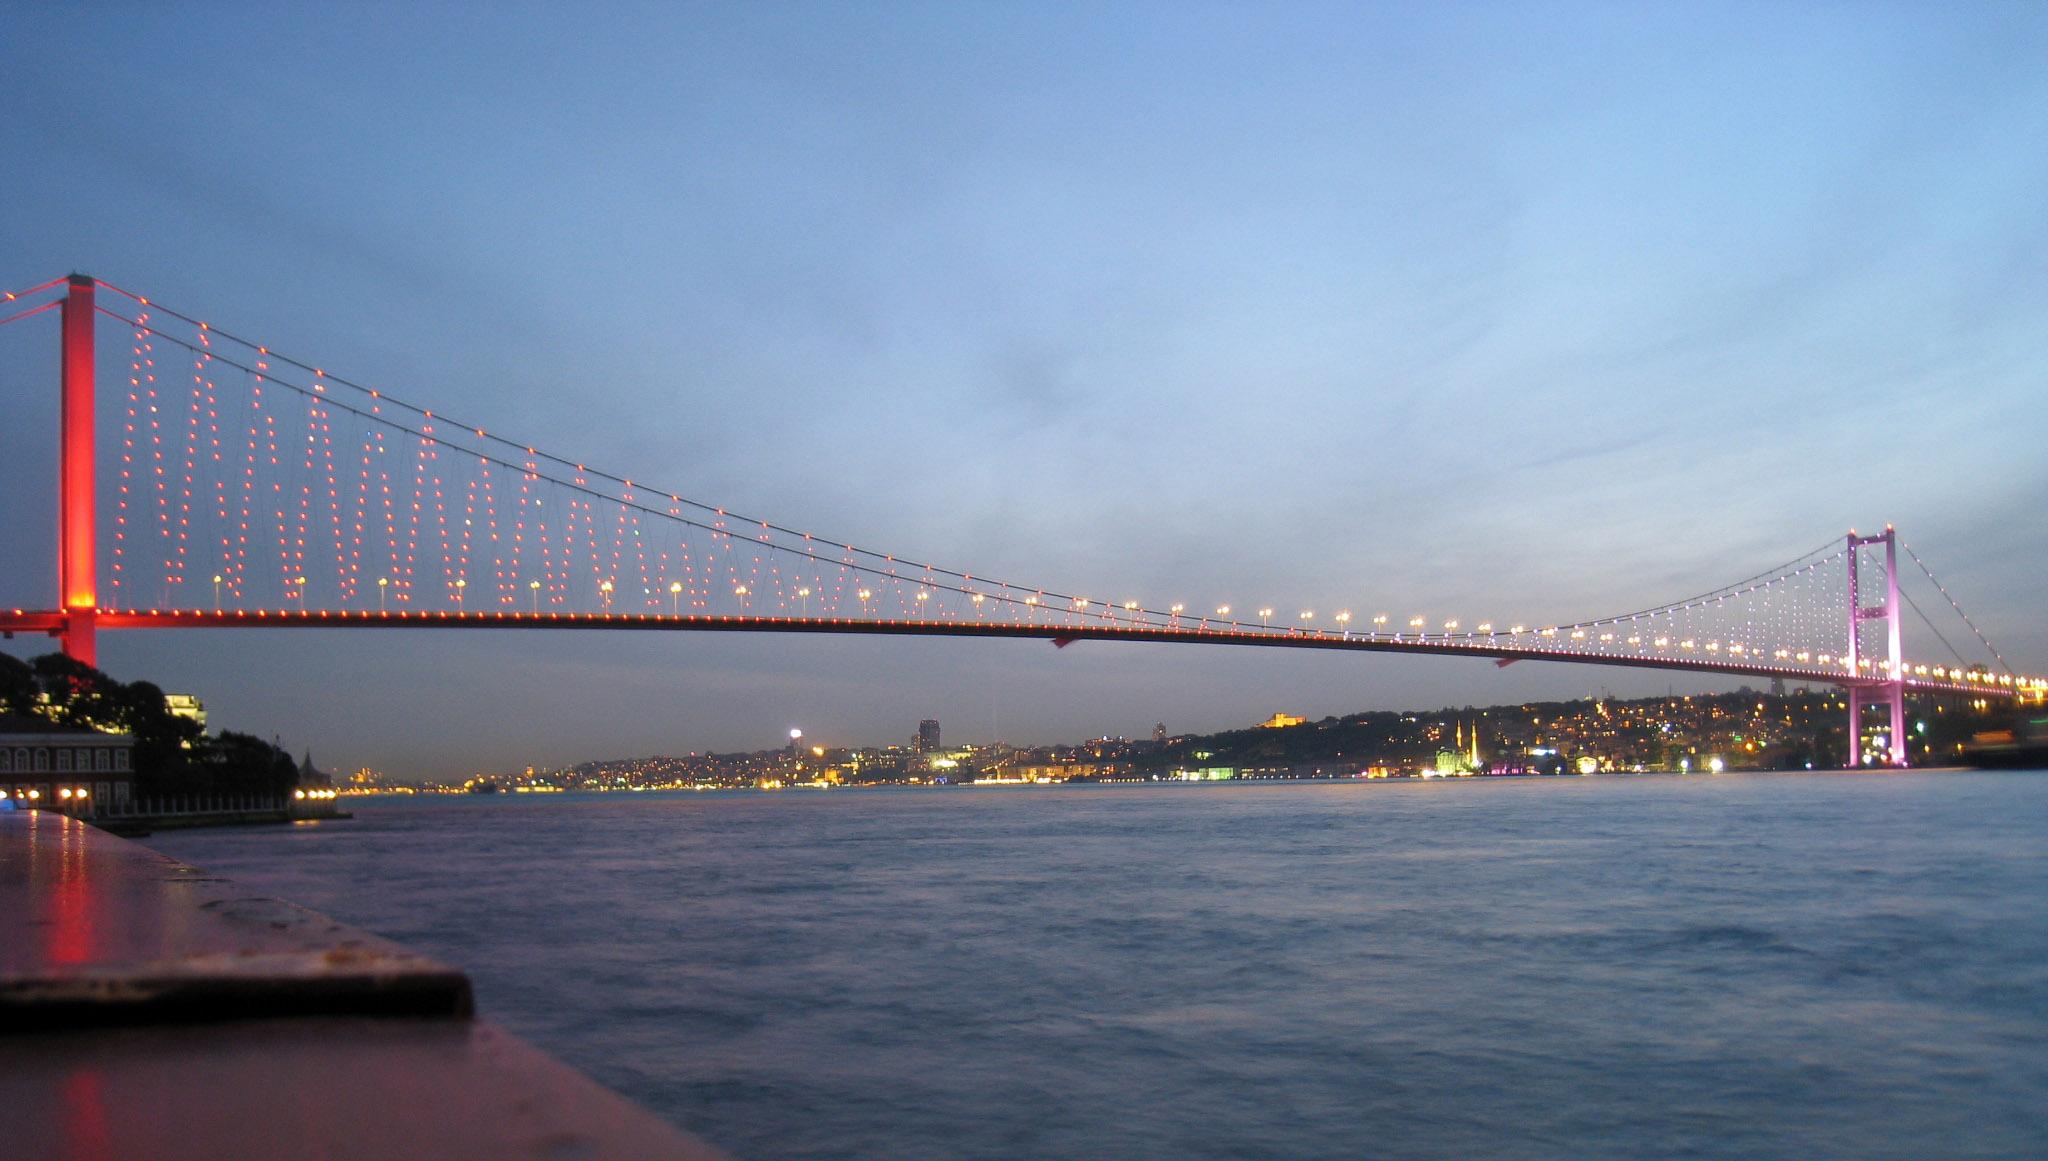 Bosphorus Bridge in Istanbul, Turkey image - Free stock photo ...